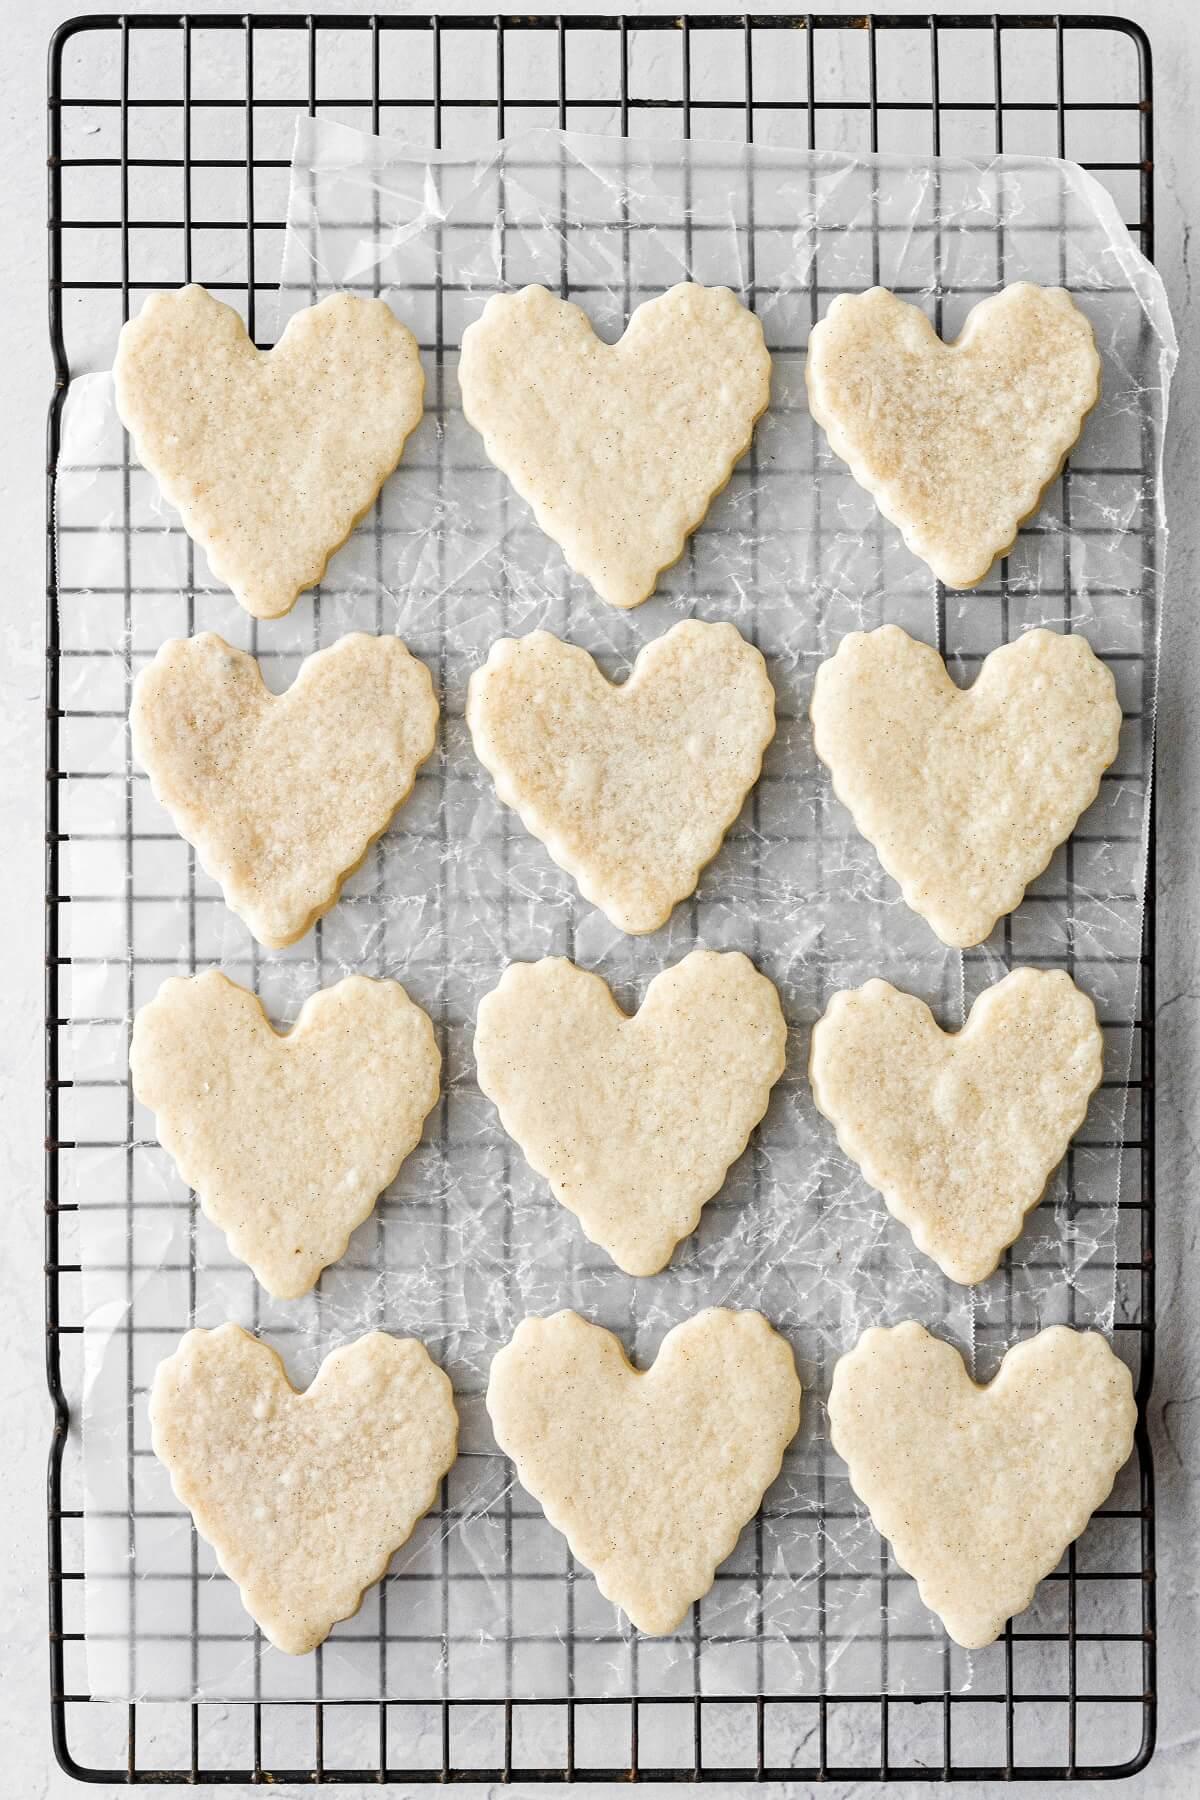 Heart shaped vanilla bean sugar cookies on a black cooling rack.